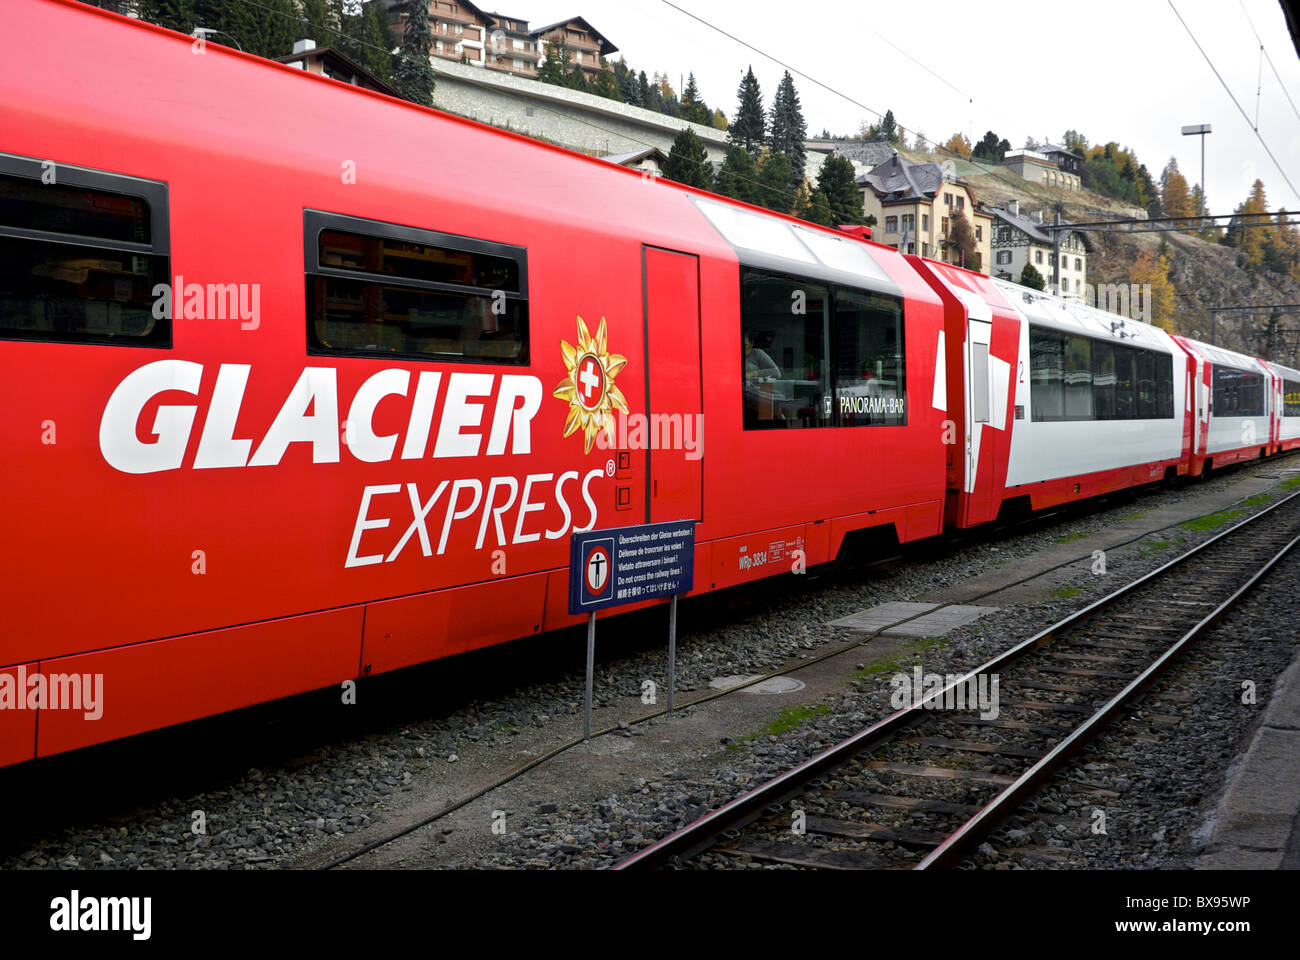 Panoramic railcars electric powered train Rhaetian Railway  Glacier Express train station St. Moritz - Stock Image